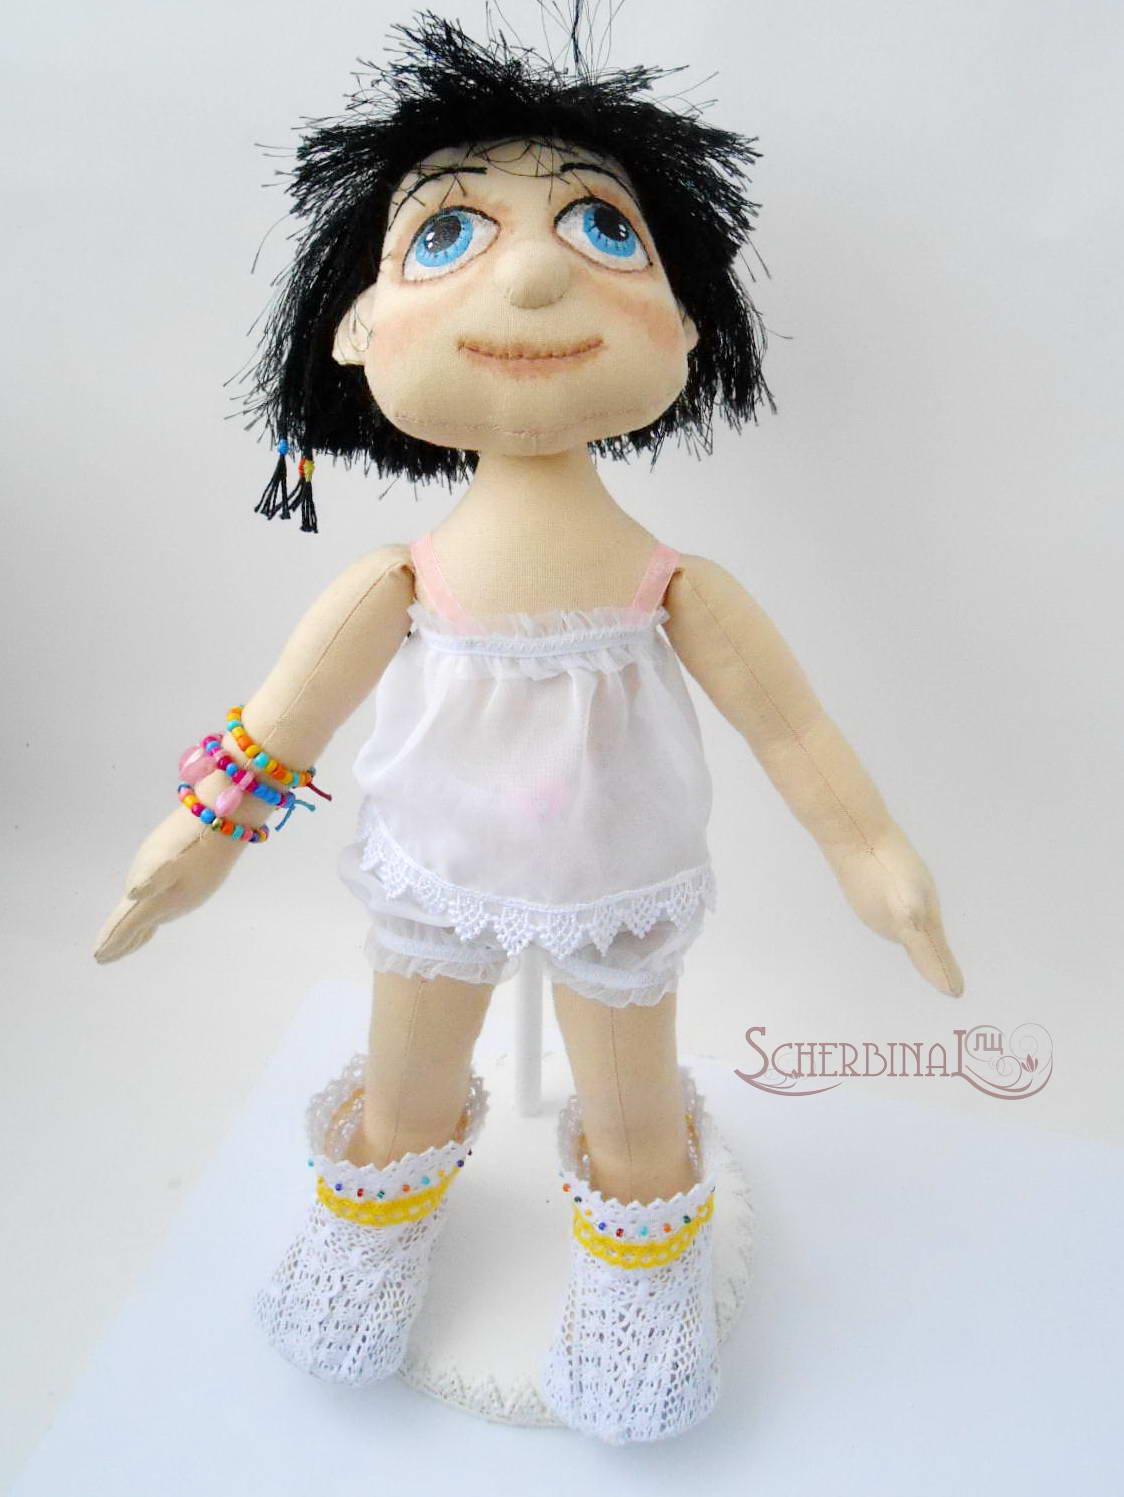 трусики для куклы своими руками, мастер класс